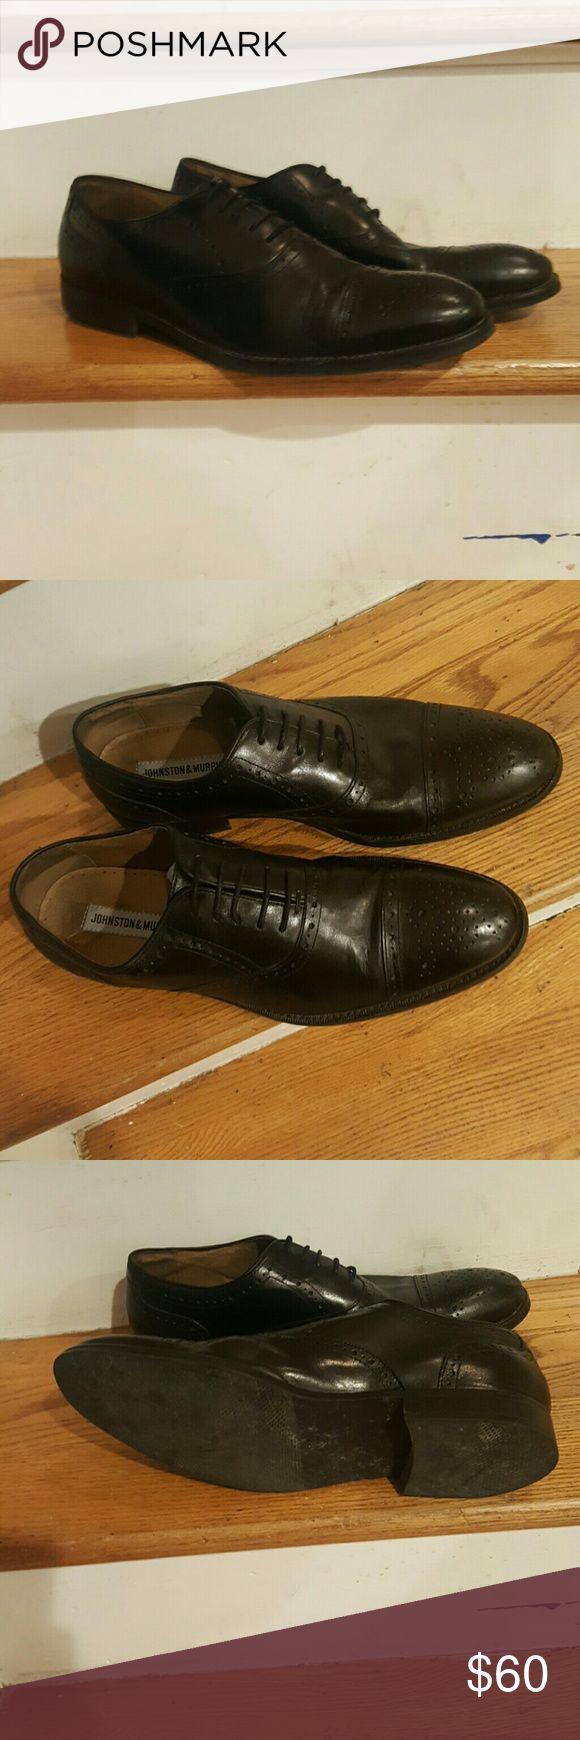 JOHNSTON & MURPHY WINGTIPS BLACK SIZE 10 Awesome black wingtips Mens dress shoes Johnston & Murphy Black leather oxfords Johnston & Murphy Shoes Oxfords & Derbys